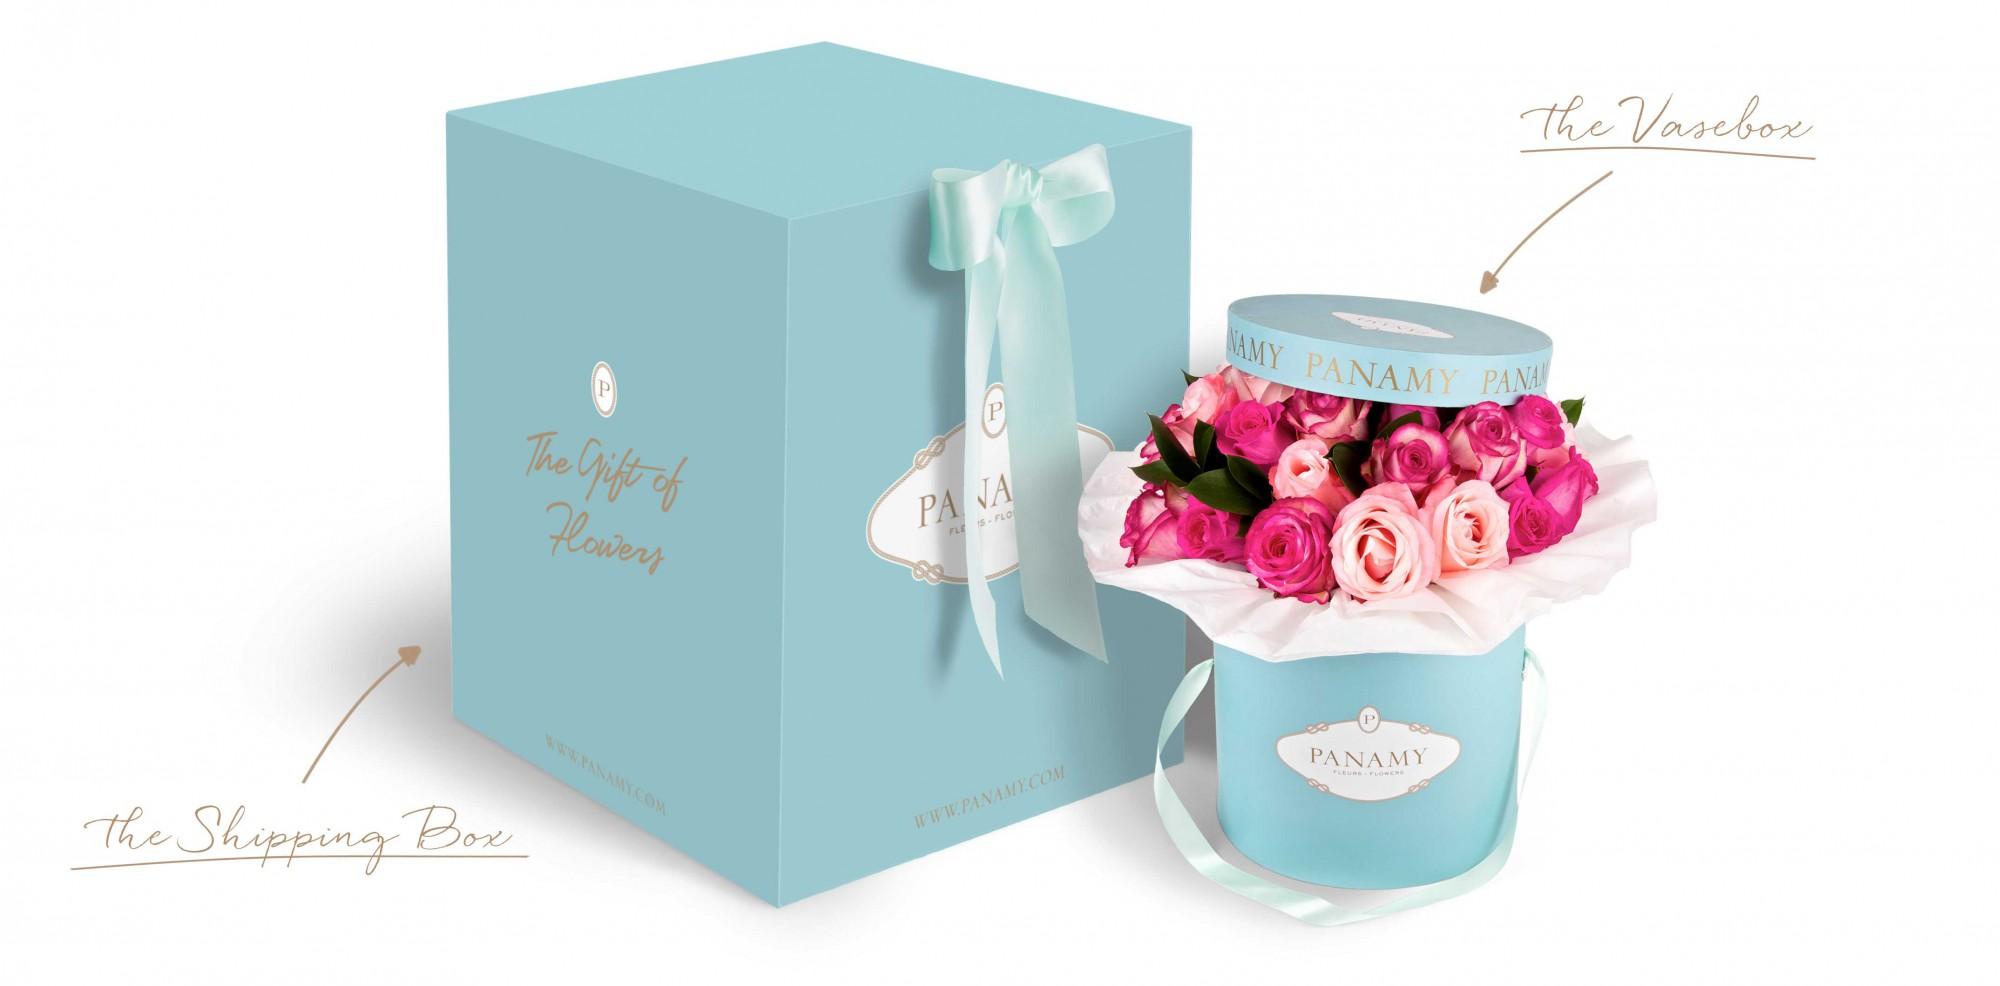 The Shipping Boxes - PANAMY Flower Delivery Switzerland Zürich, Basel, Luzern, Zug, Bern